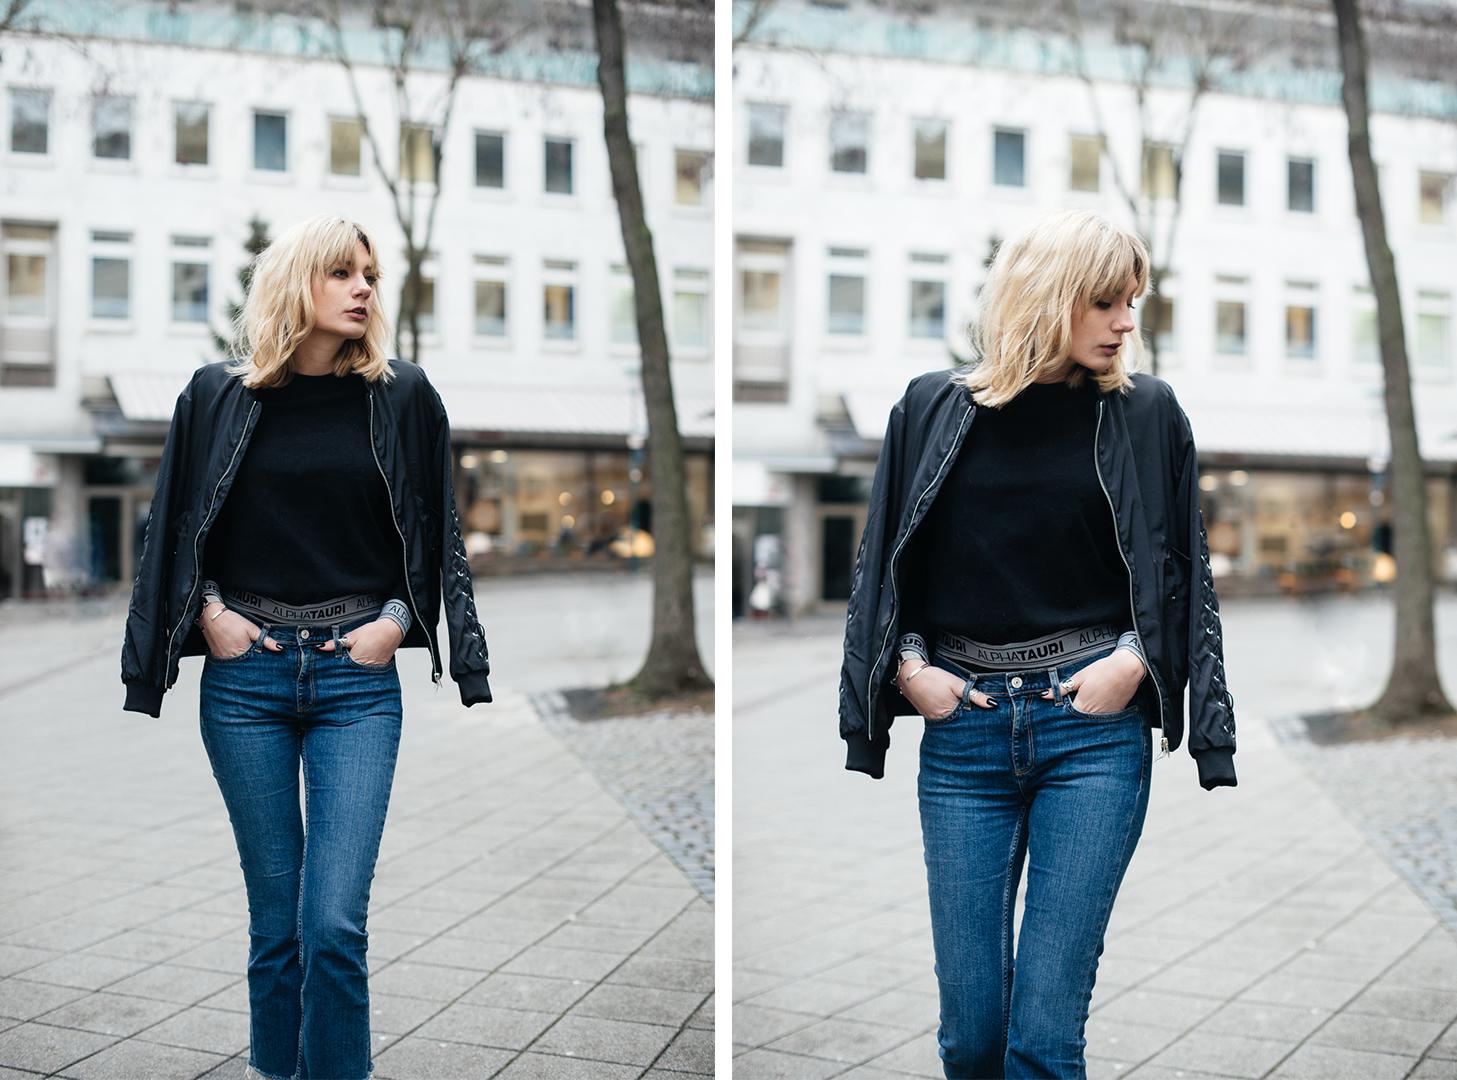 Kiamisu_Zign_Cropped Jeans ausgfranst_Mango_Schuhe_Leo Schal_Outfit_Inspiration_Fashionblog_Modeblog_Kiamisu-collage-1--